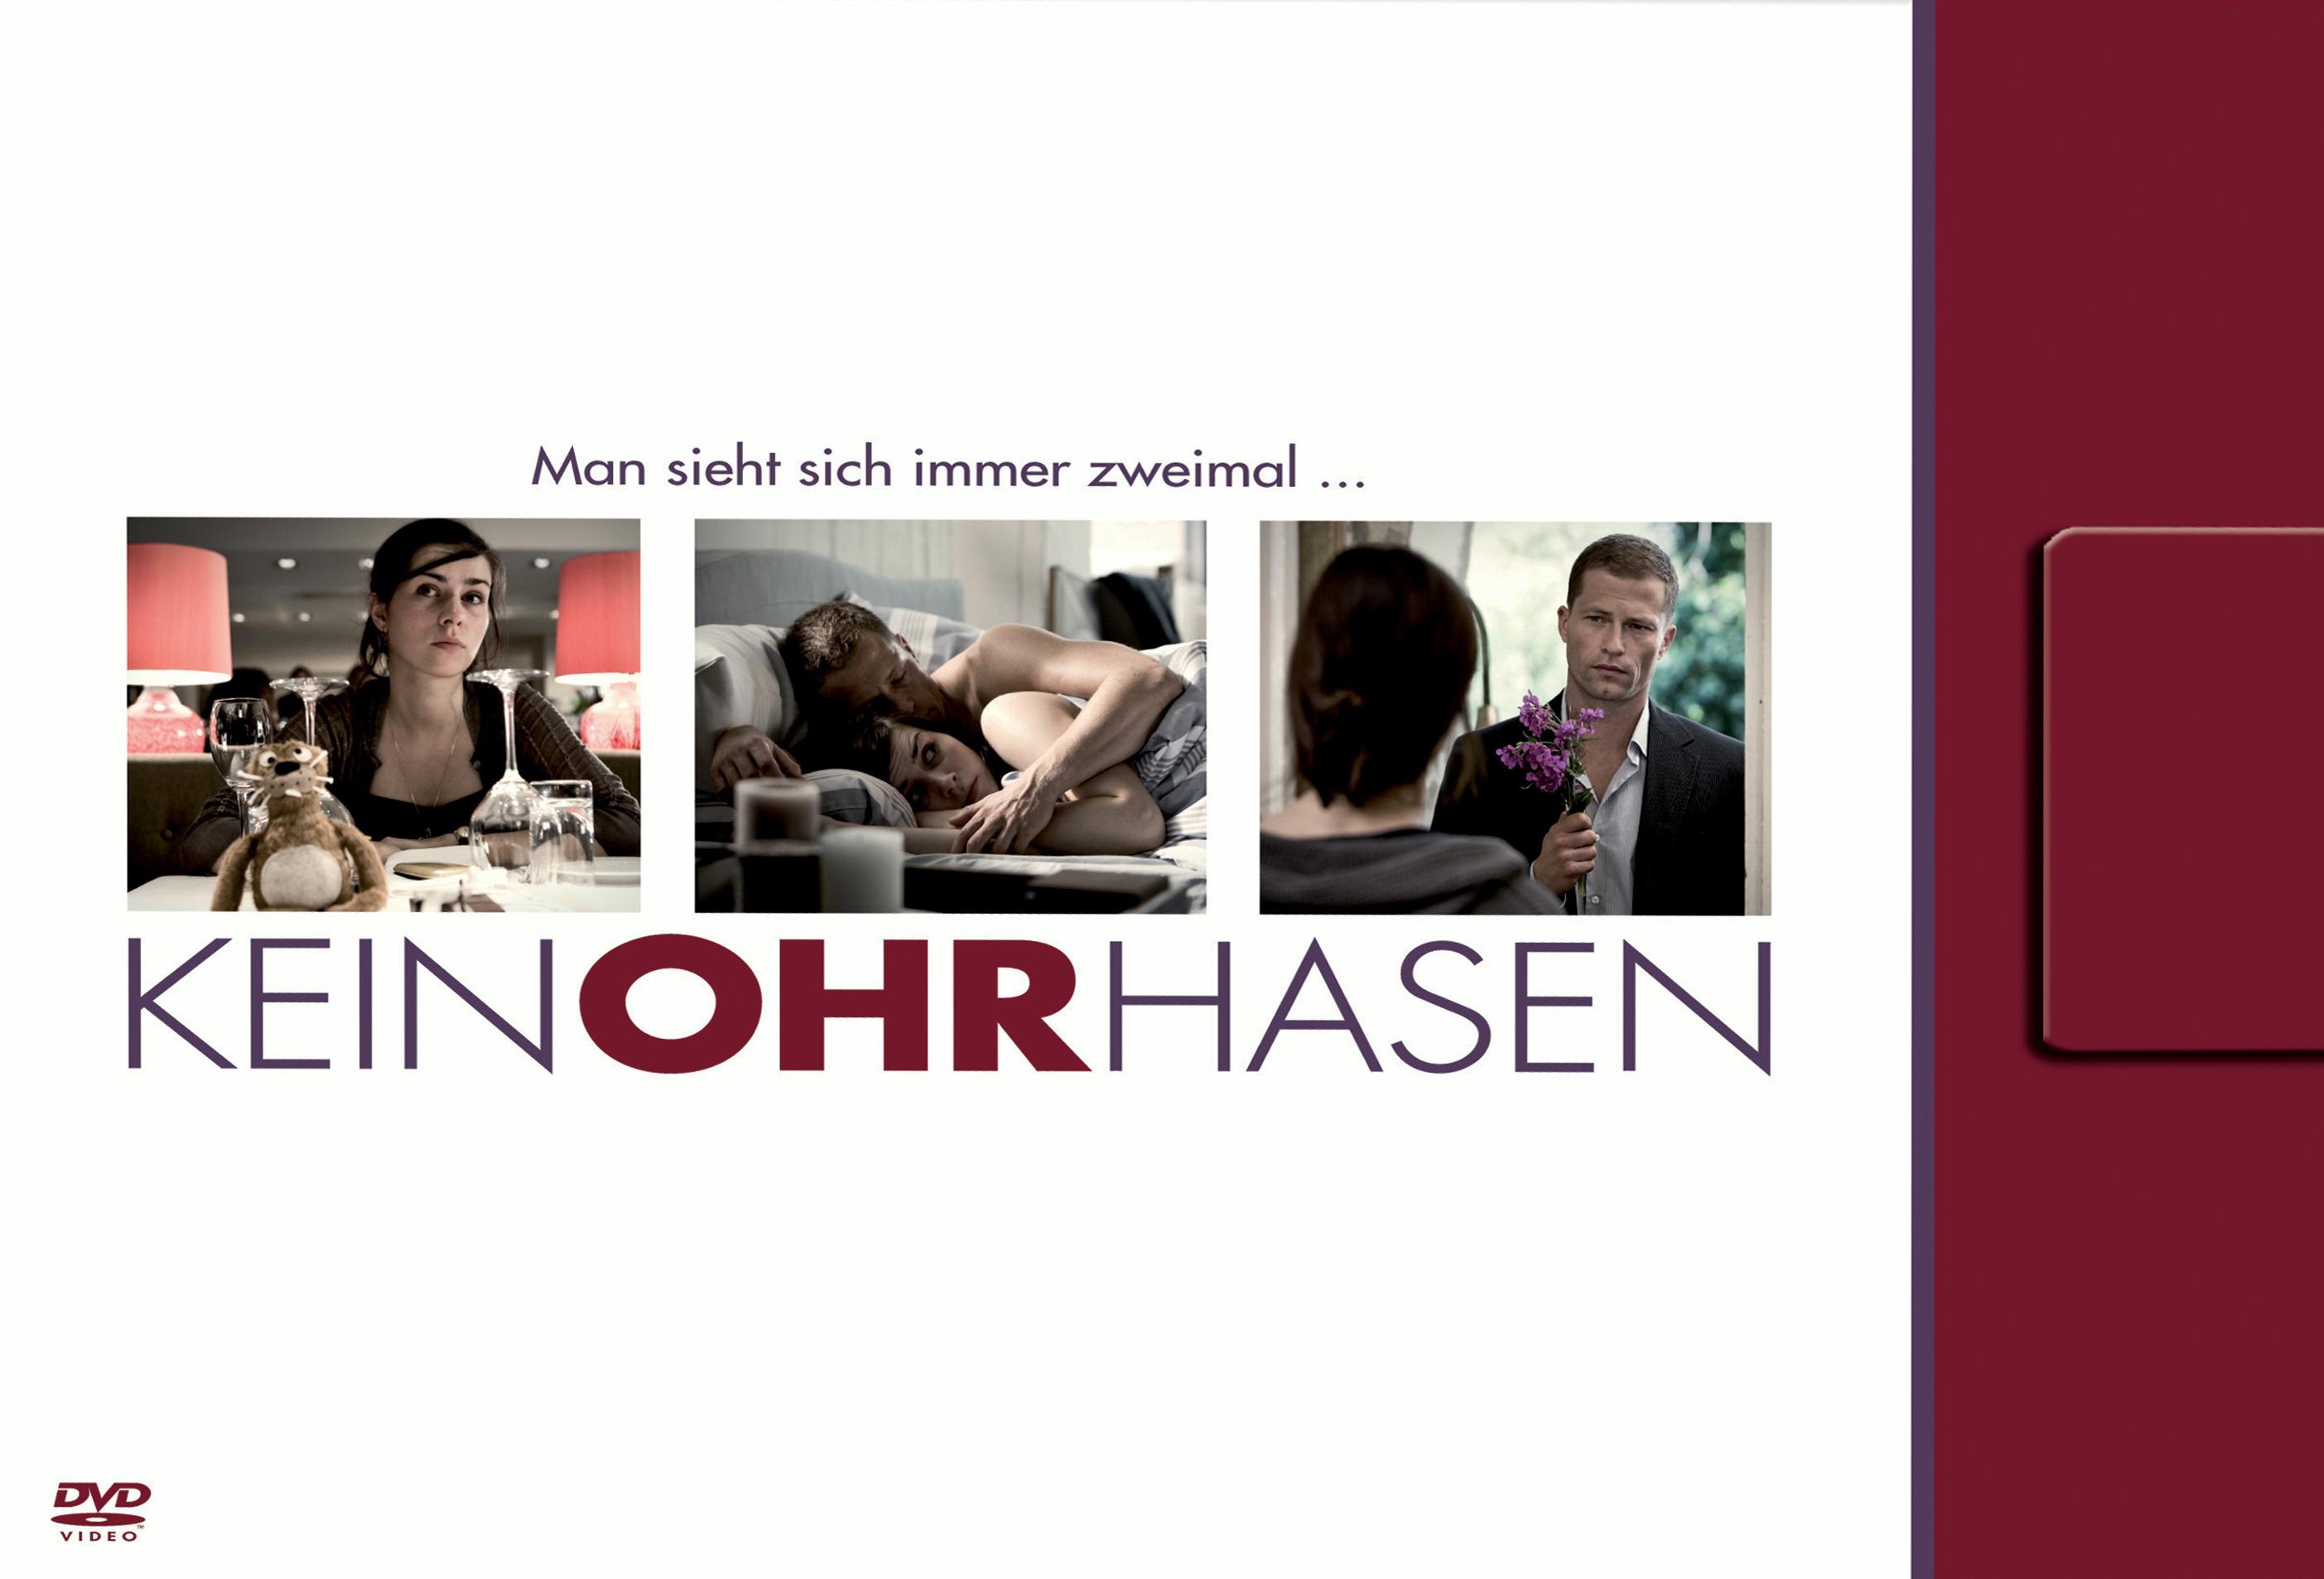 Keinohrhasen (Flipbook, Special Edition, 2 DVDs, + Digital Copy) Poster